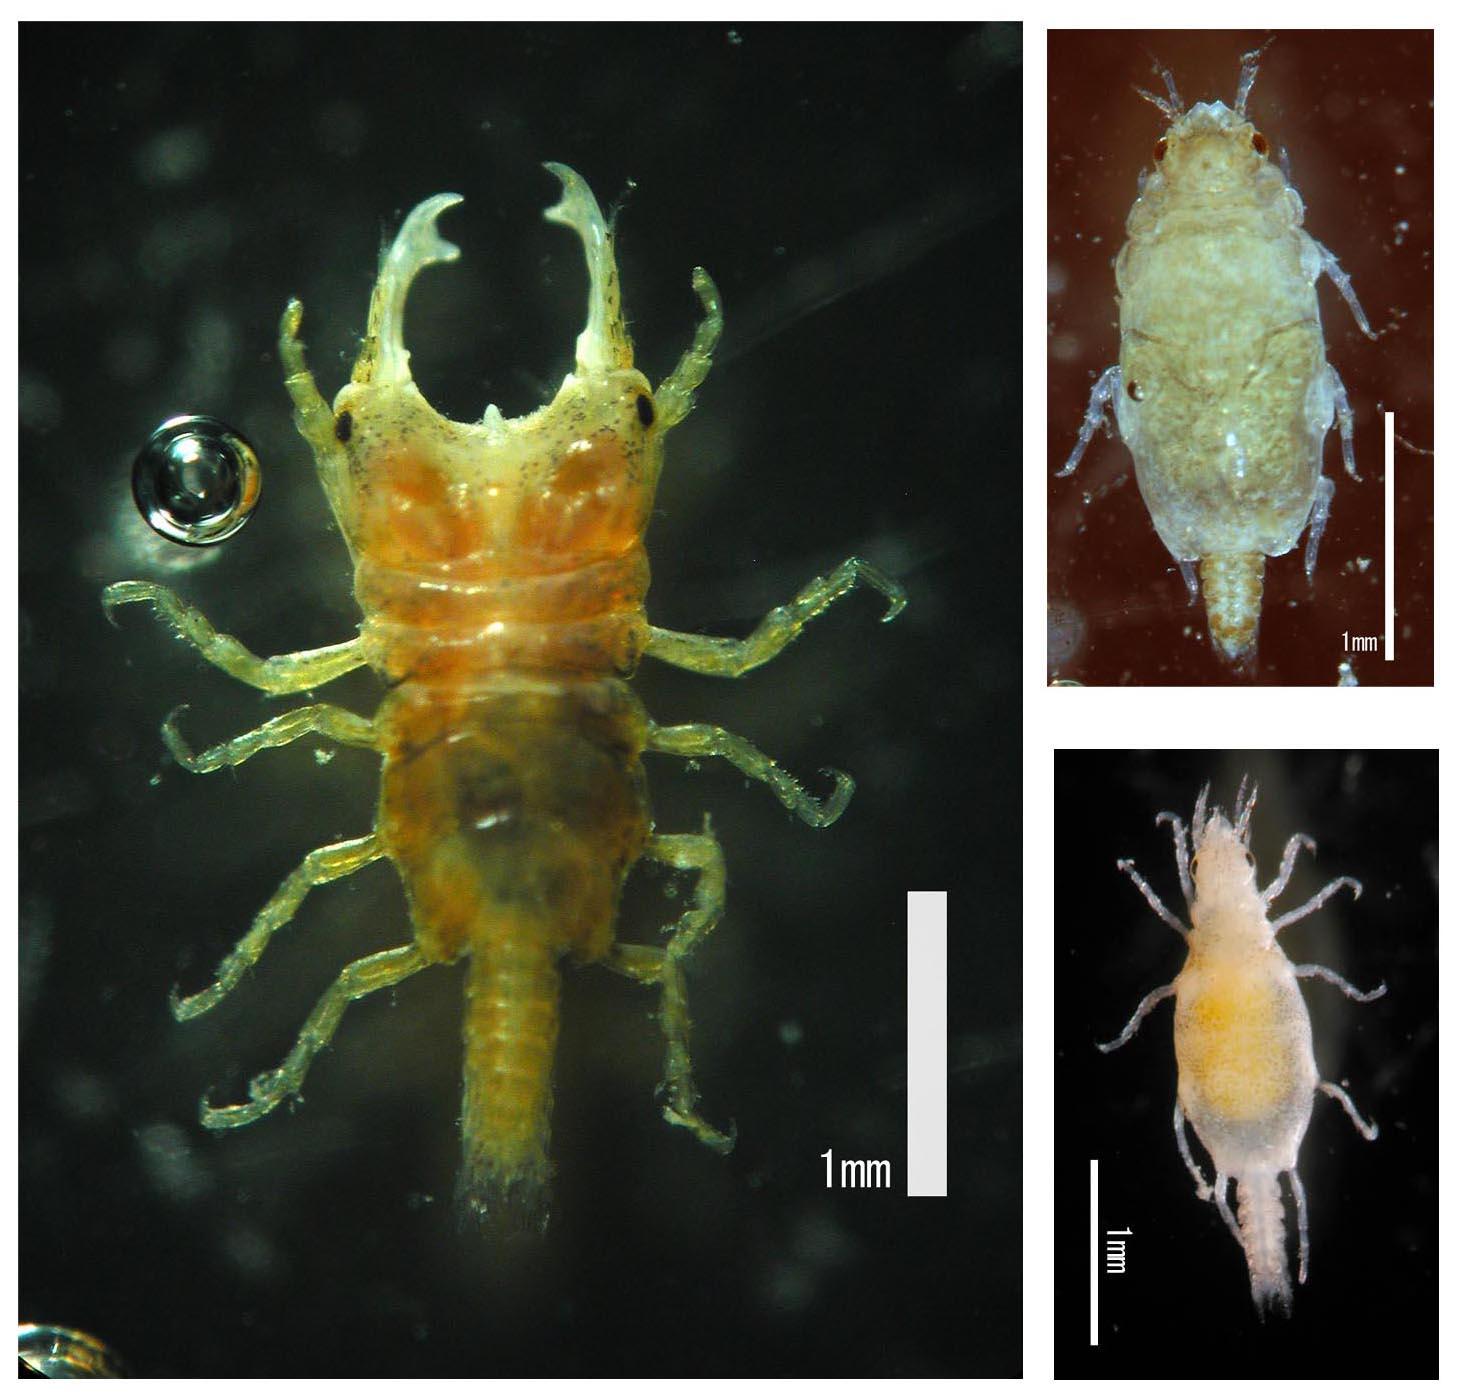 izopod paraziták